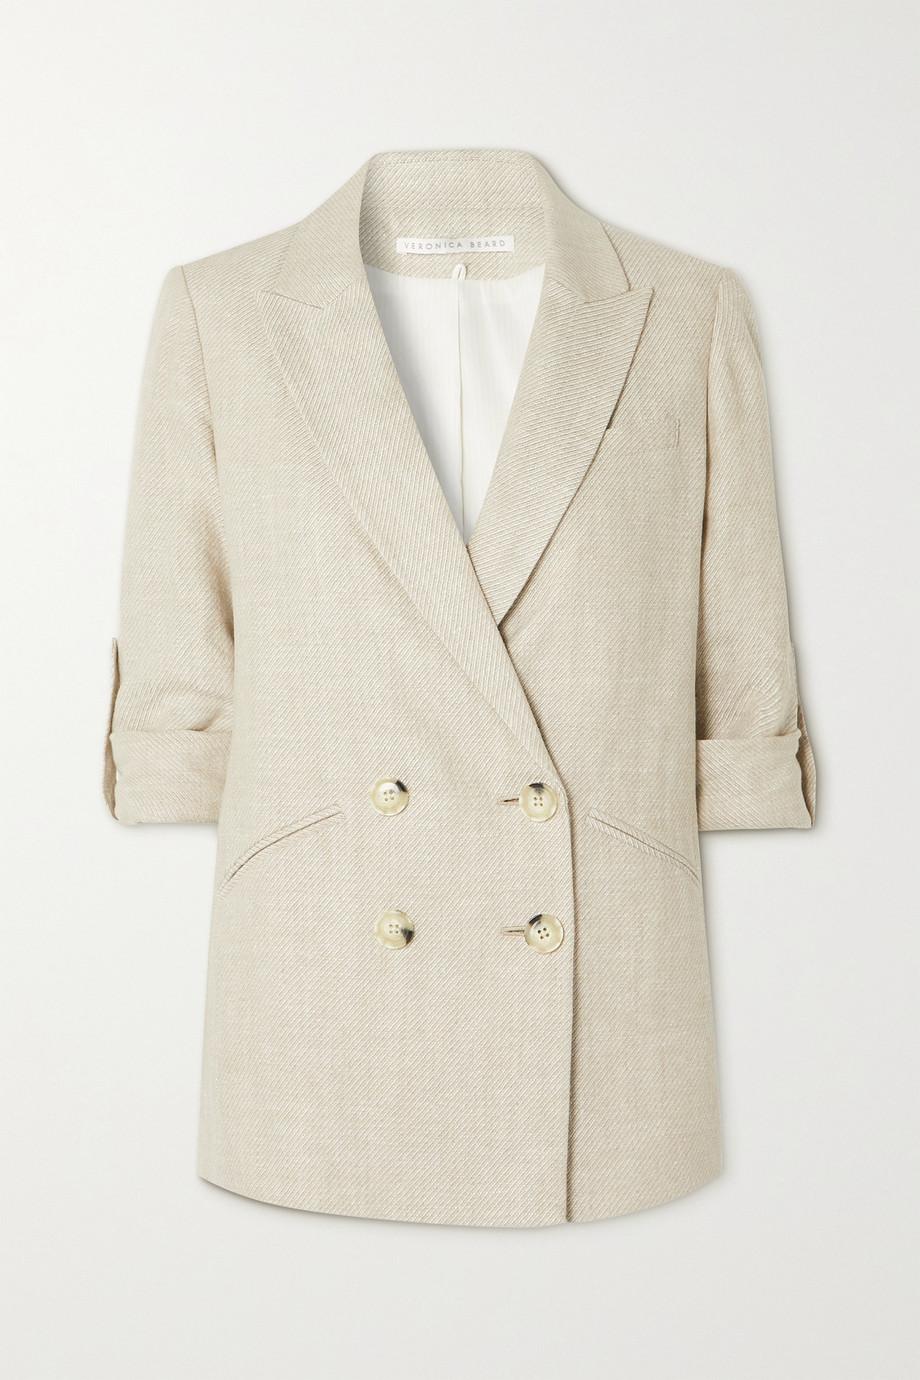 Veronica Beard Parineti double-breasted linen-twill blazer